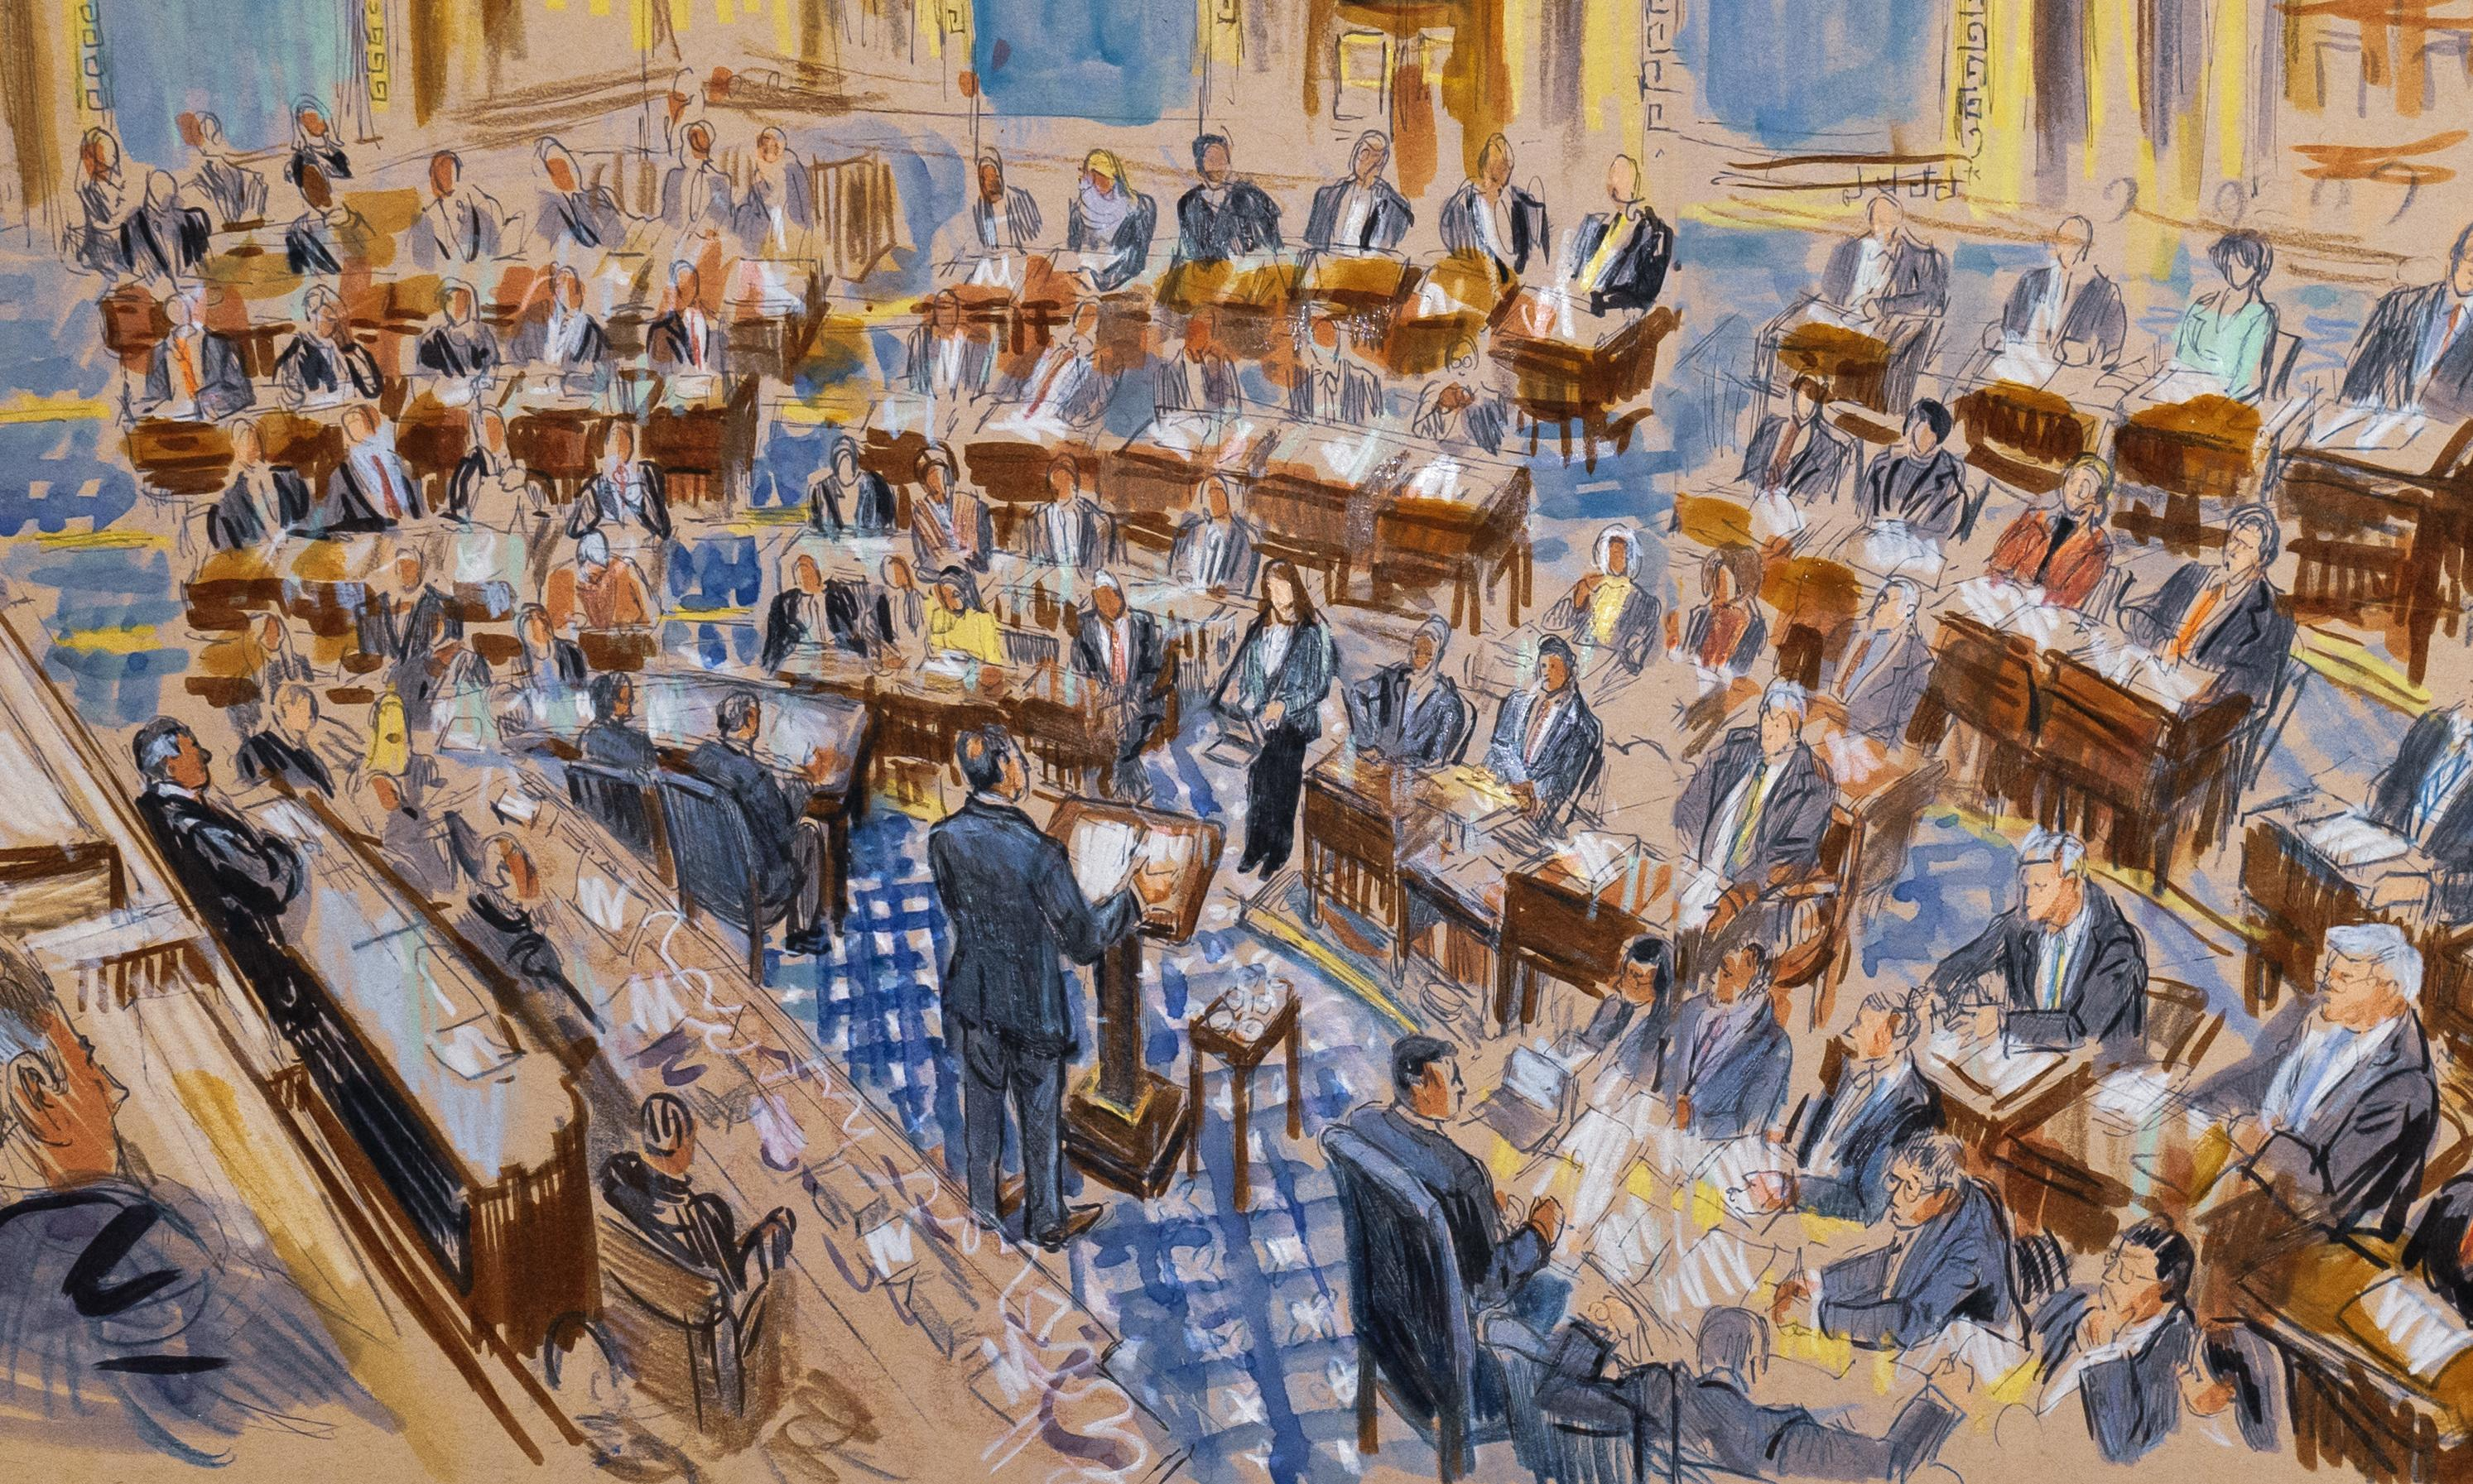 Naps, candy, paper planes: how senators are tolerating the impeachment trial